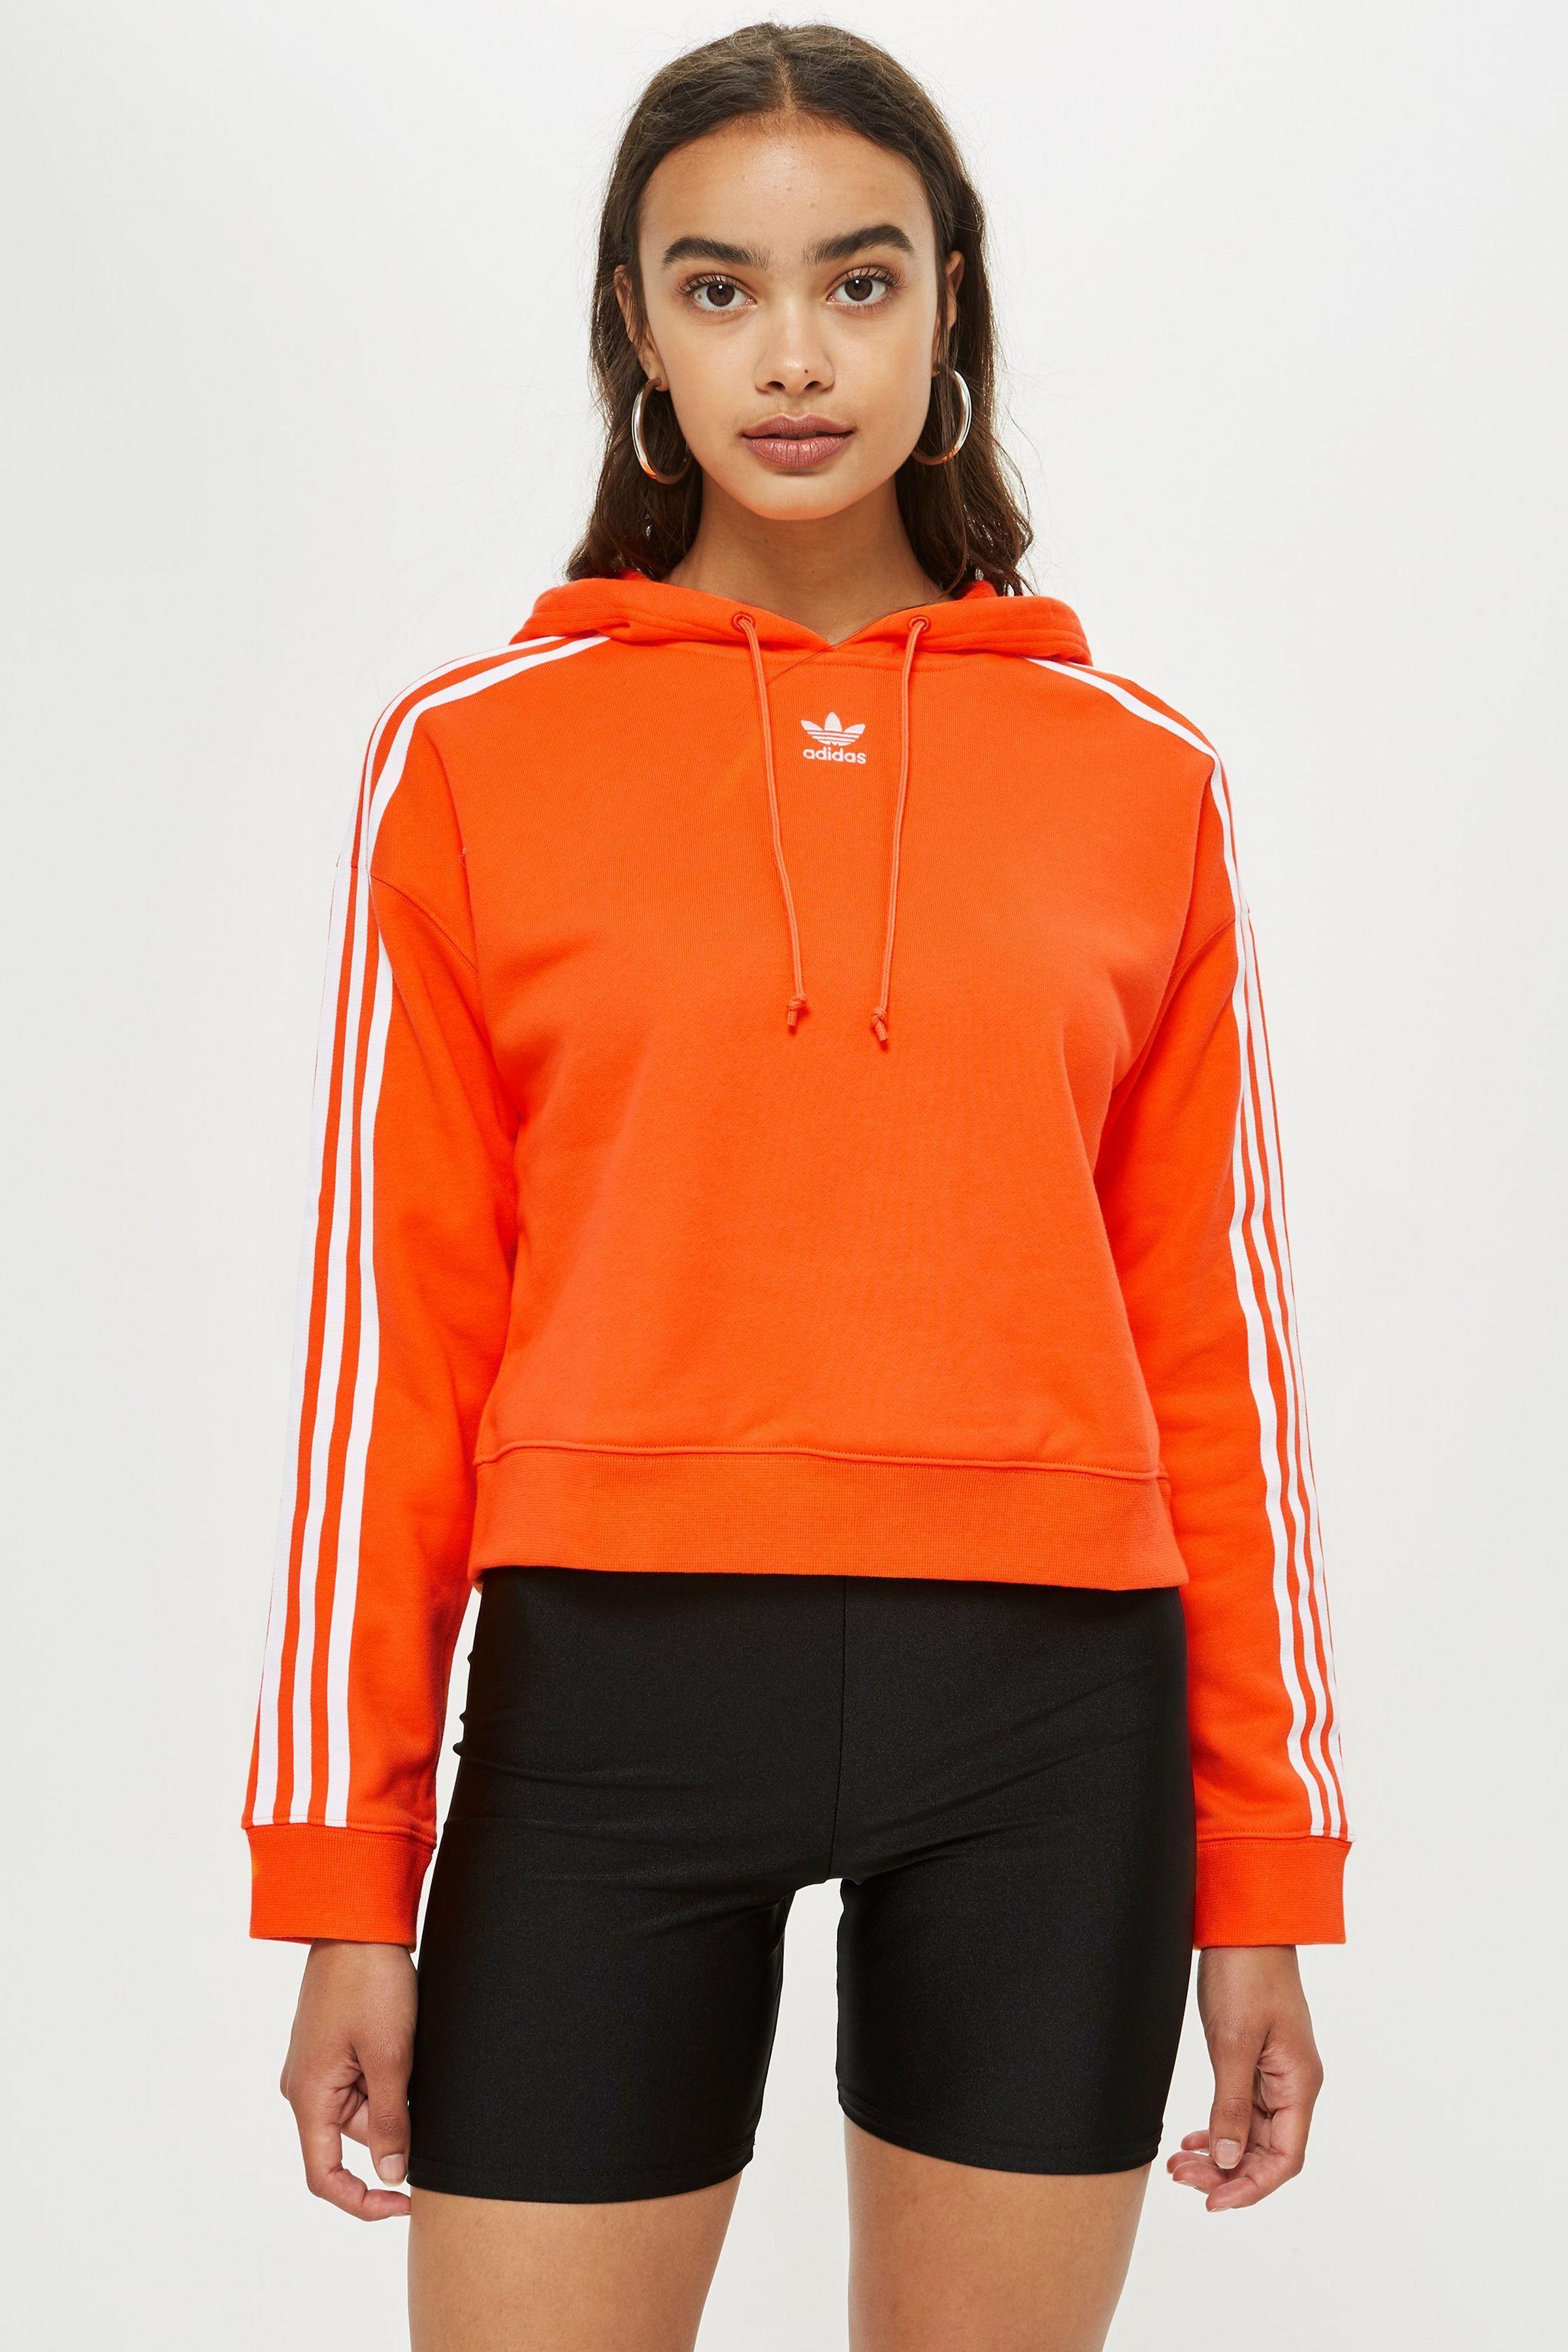 Three Striped Crop Hoodie By Adidas Topshop Adidas Sweatshirt Women Cropped Hoodie Fashion [ 3600 x 2400 Pixel ]